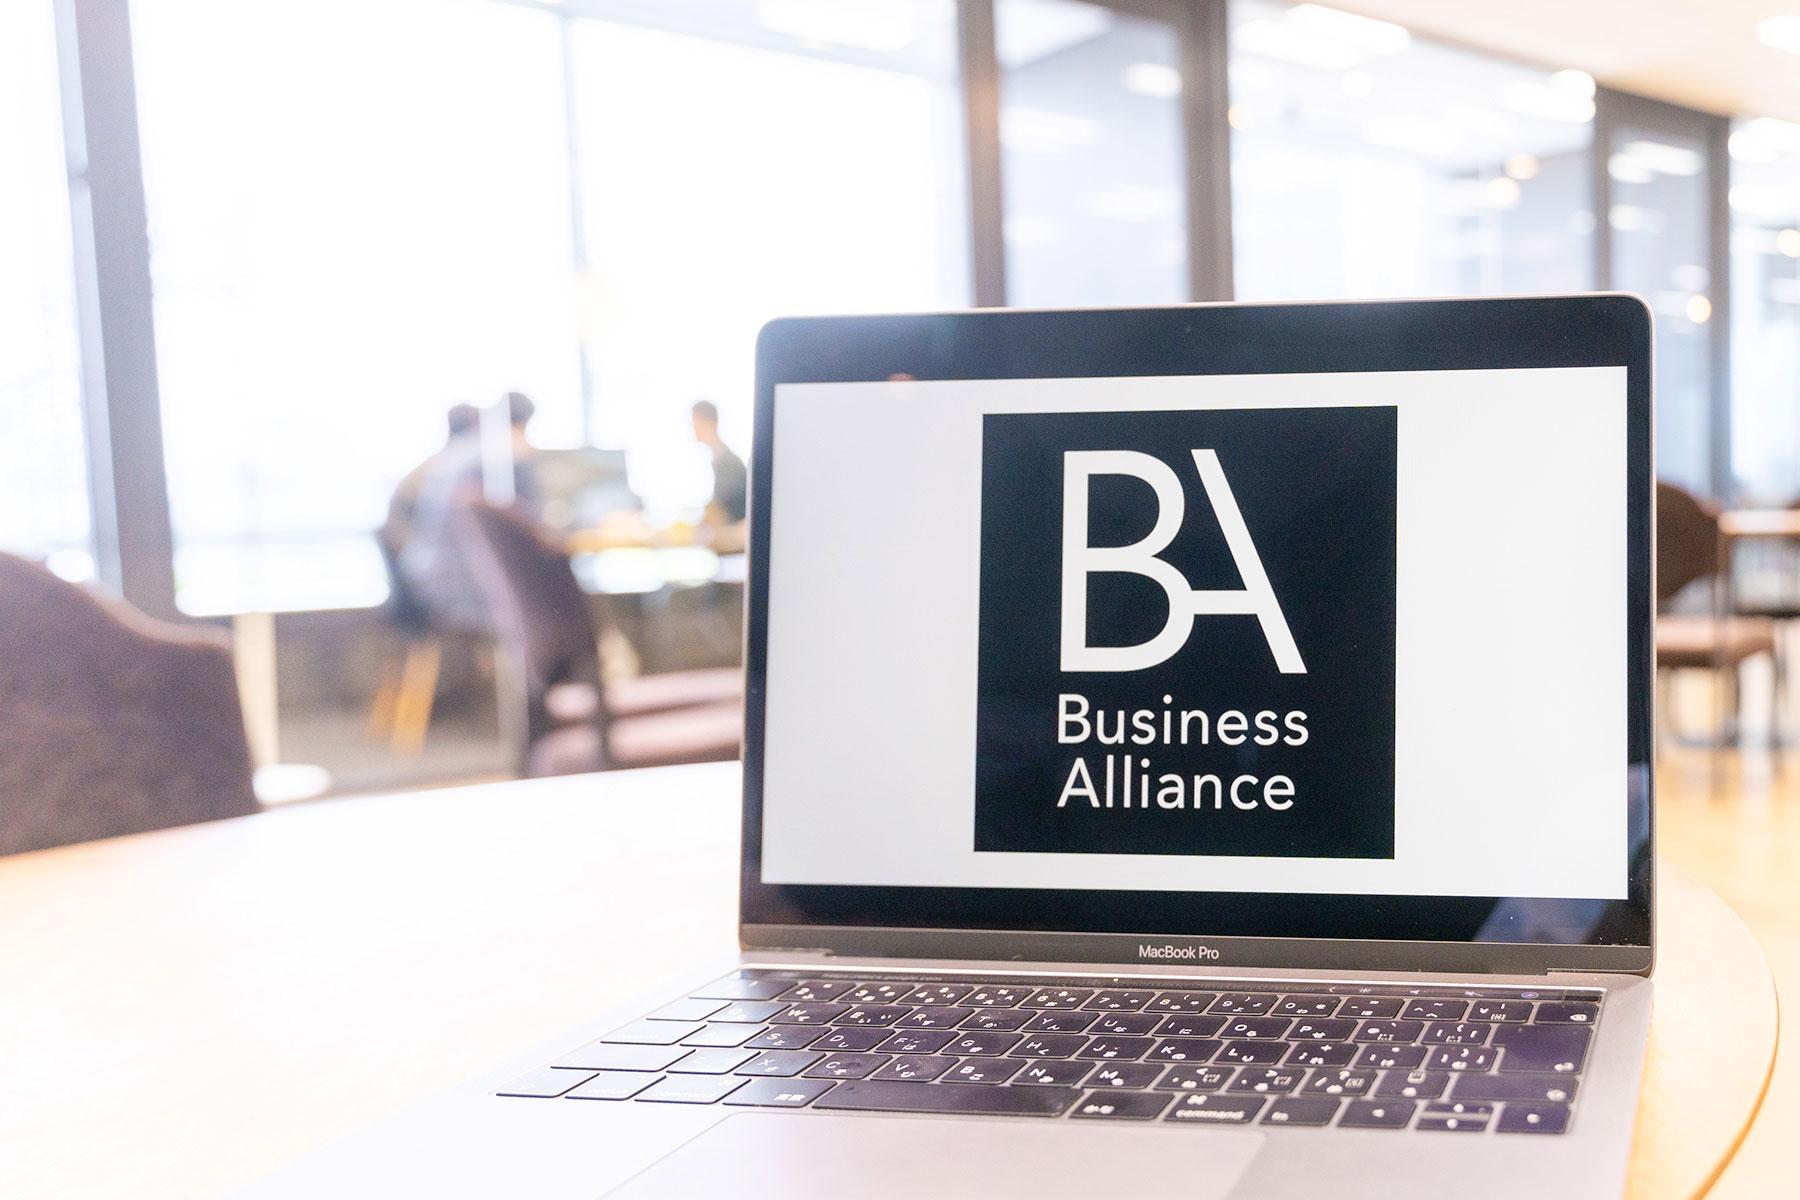 BUSINESS-ALLIANCE株式会社のトップ画像